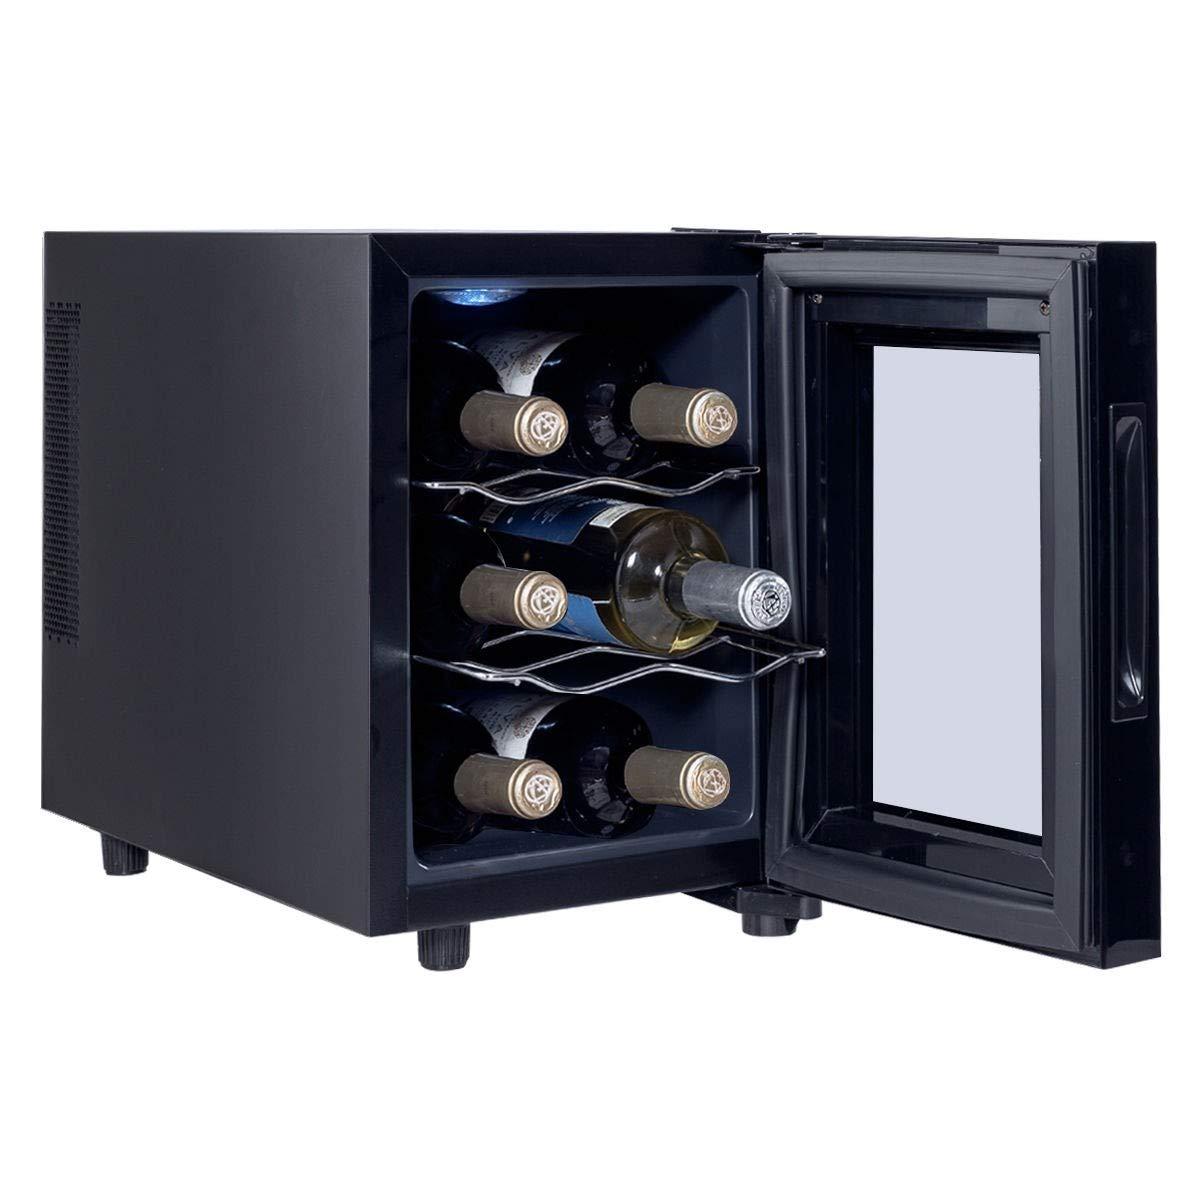 6 Bottle Freestanding Thermoelectric Wine Cooler Freestanding New Perfect Beautiful Classic Elegant Useful CHOOSEandBUY